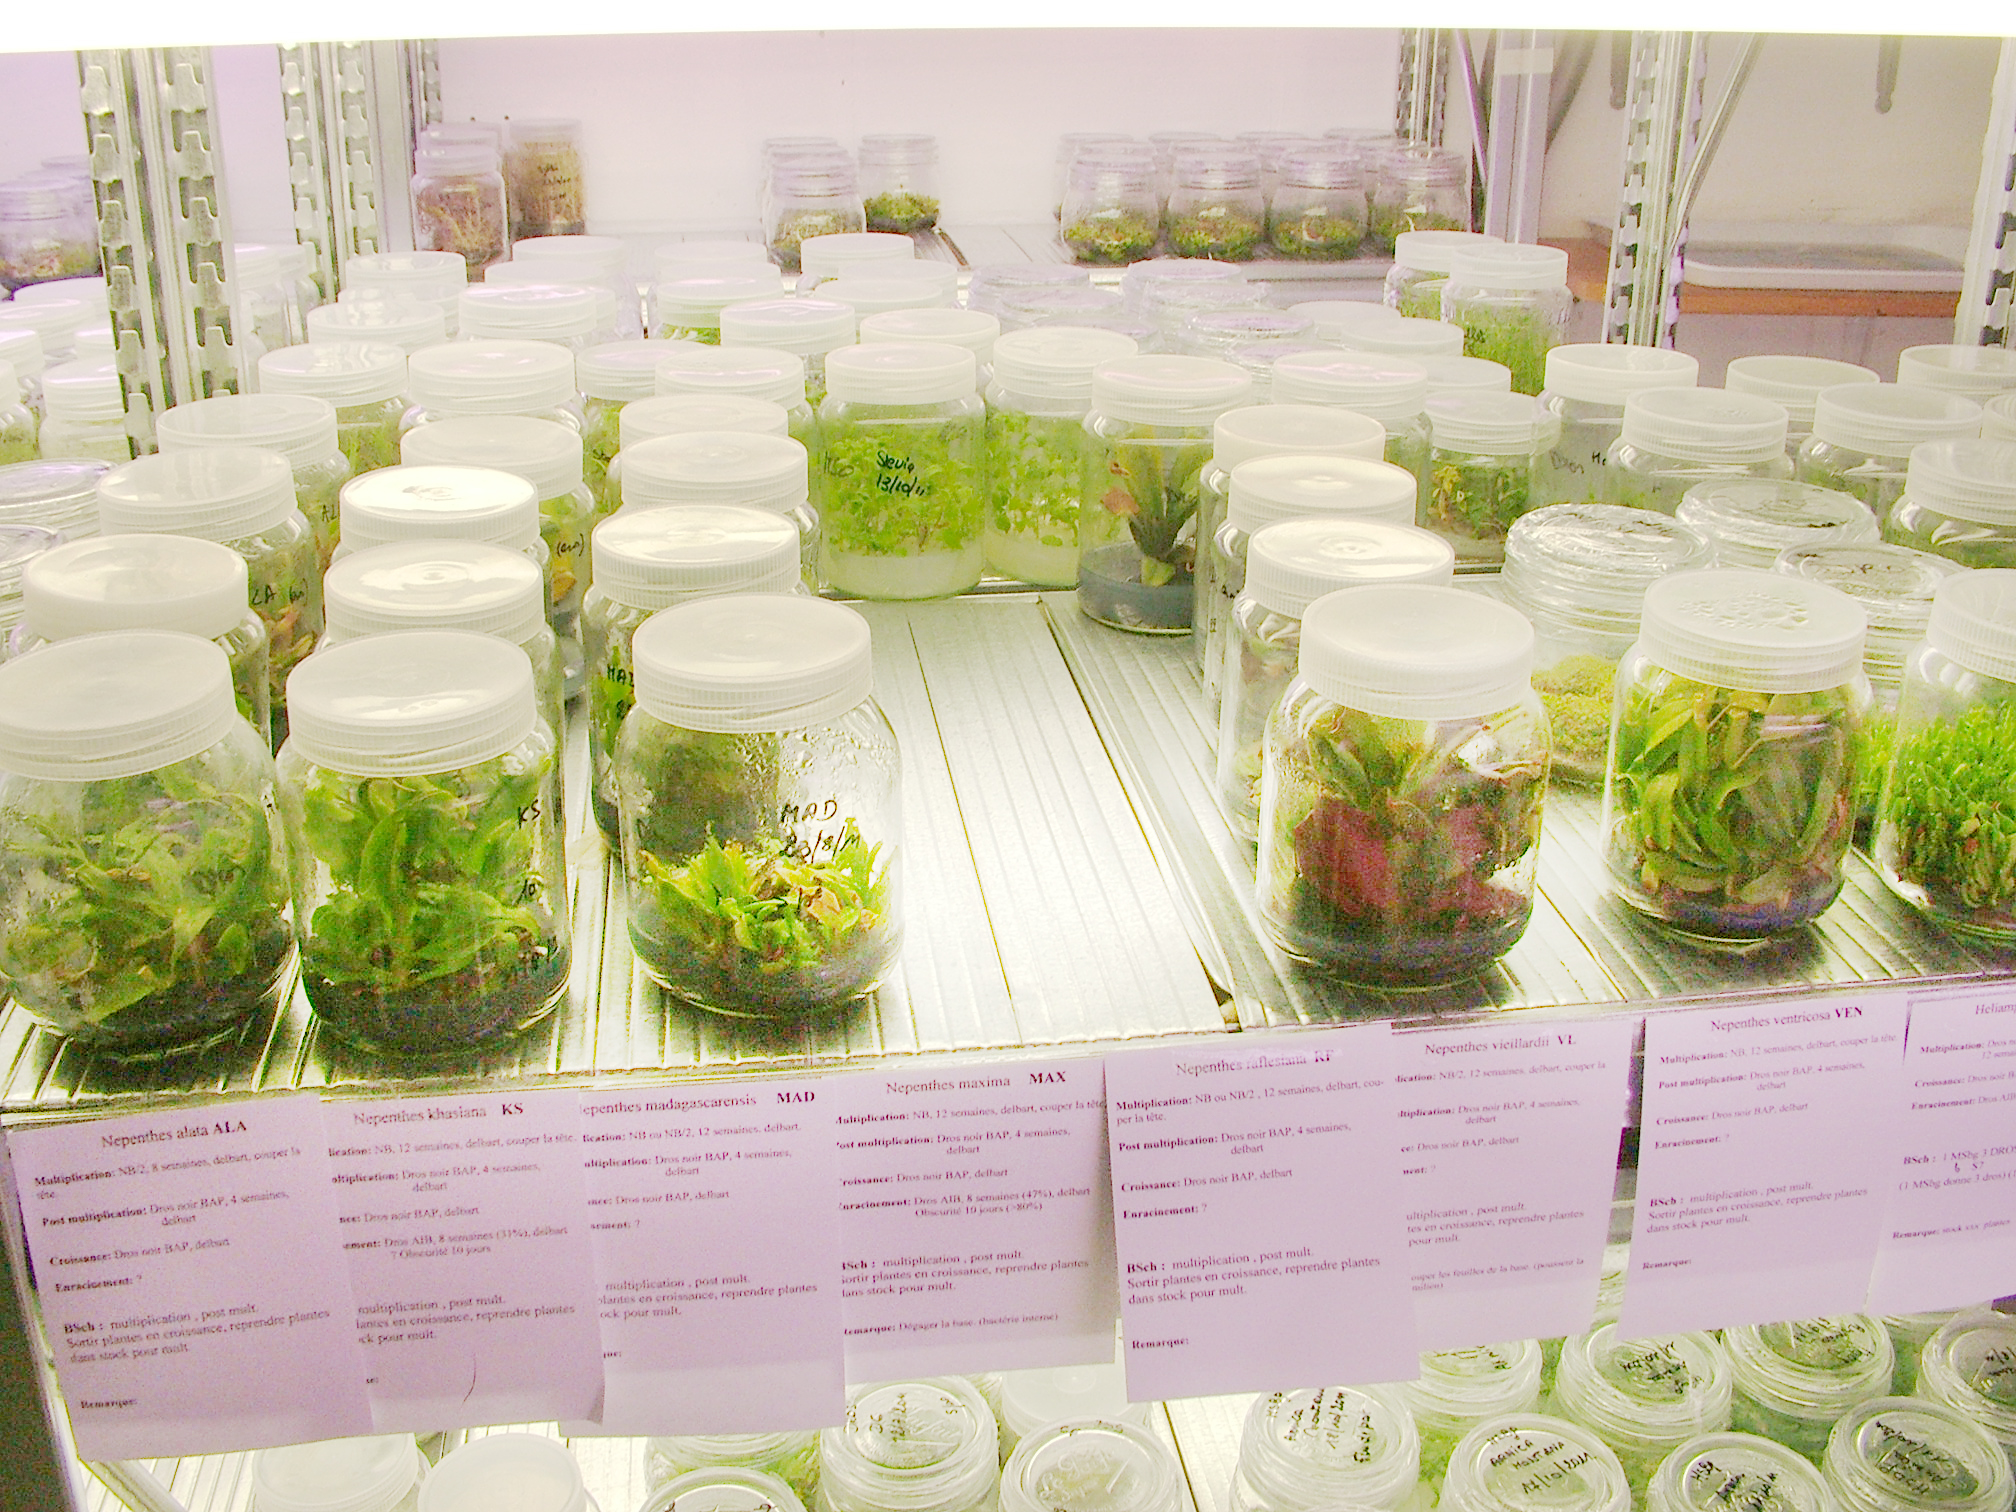 PhytoSYSTEMS in vitro culture